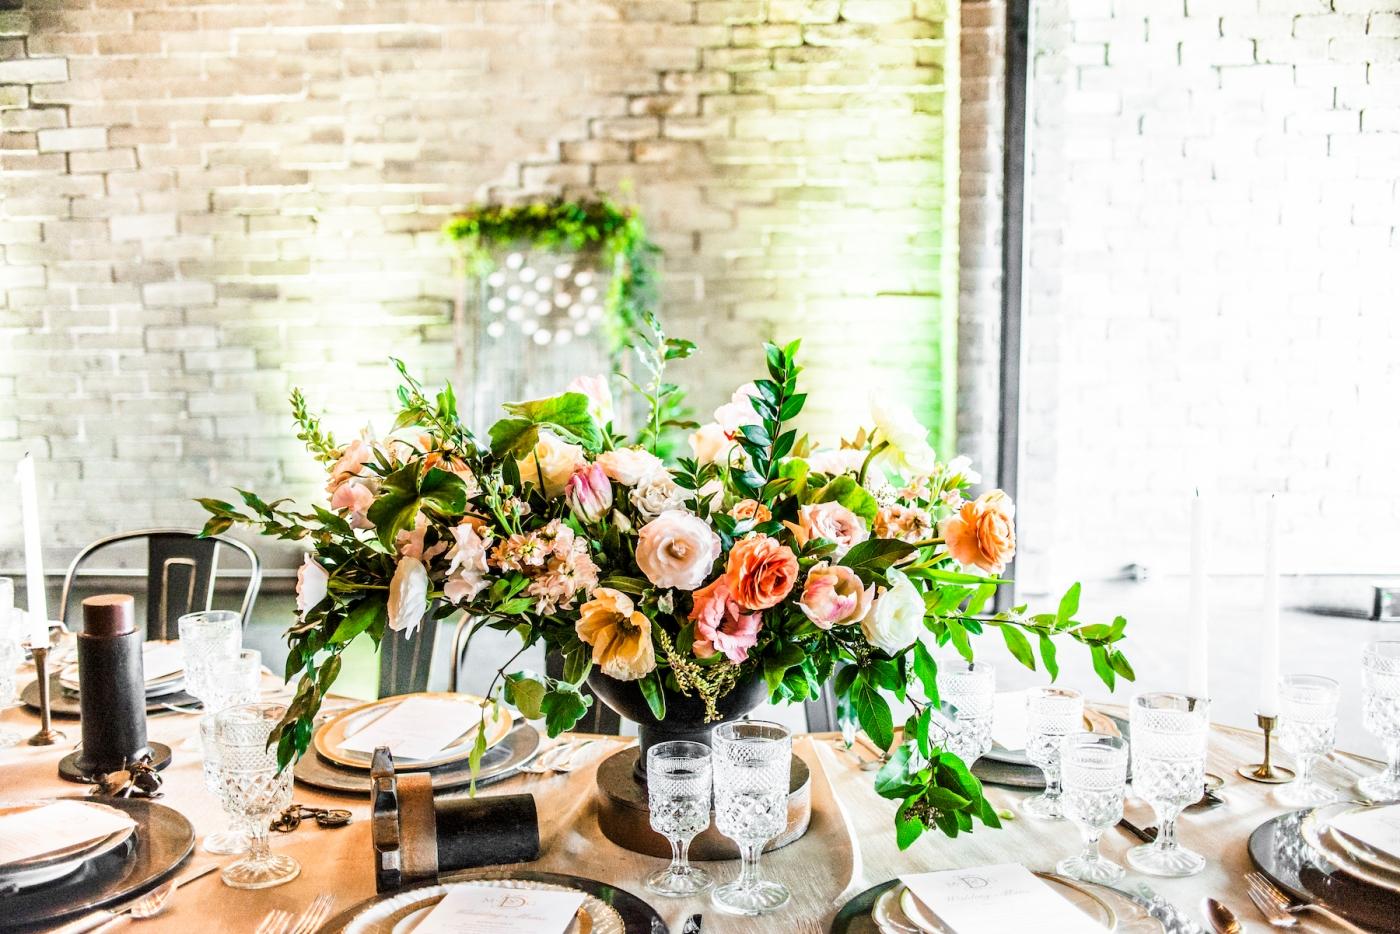 photography_by_jane_speleers_2017_wedding_show_i_do_sodo_within_designed_by_melody_davisdsc_0322